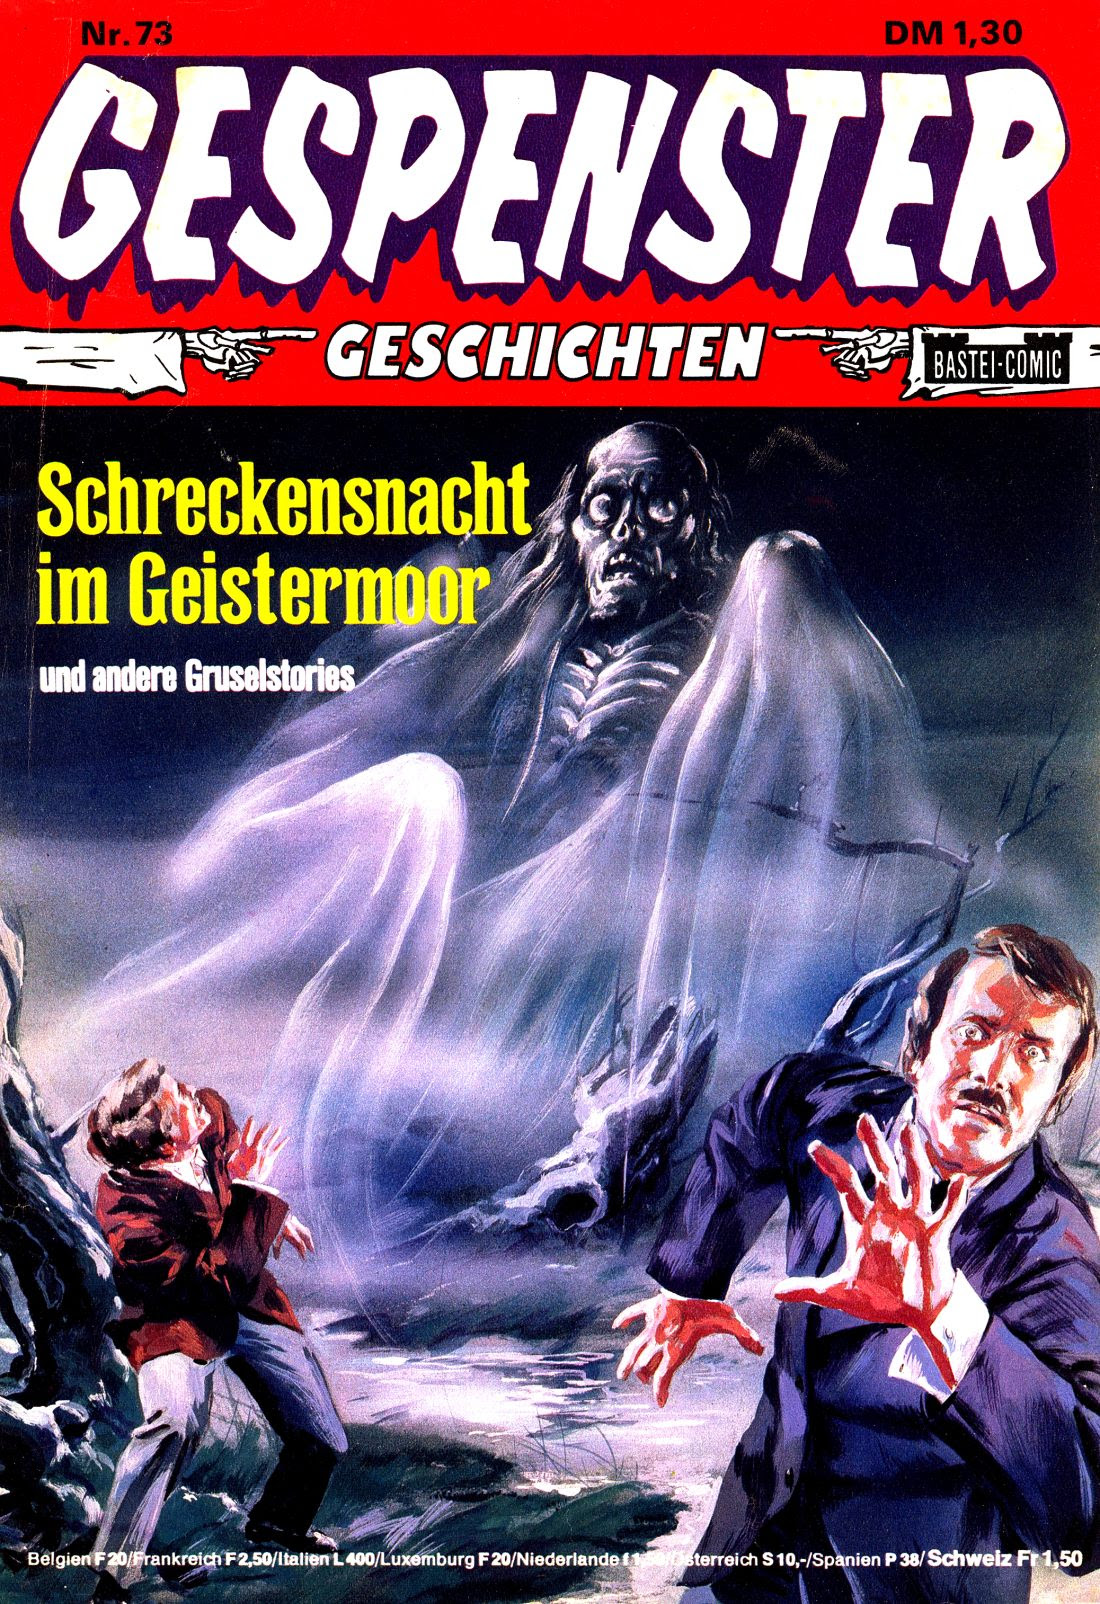 Gespenster Geschichten - 73